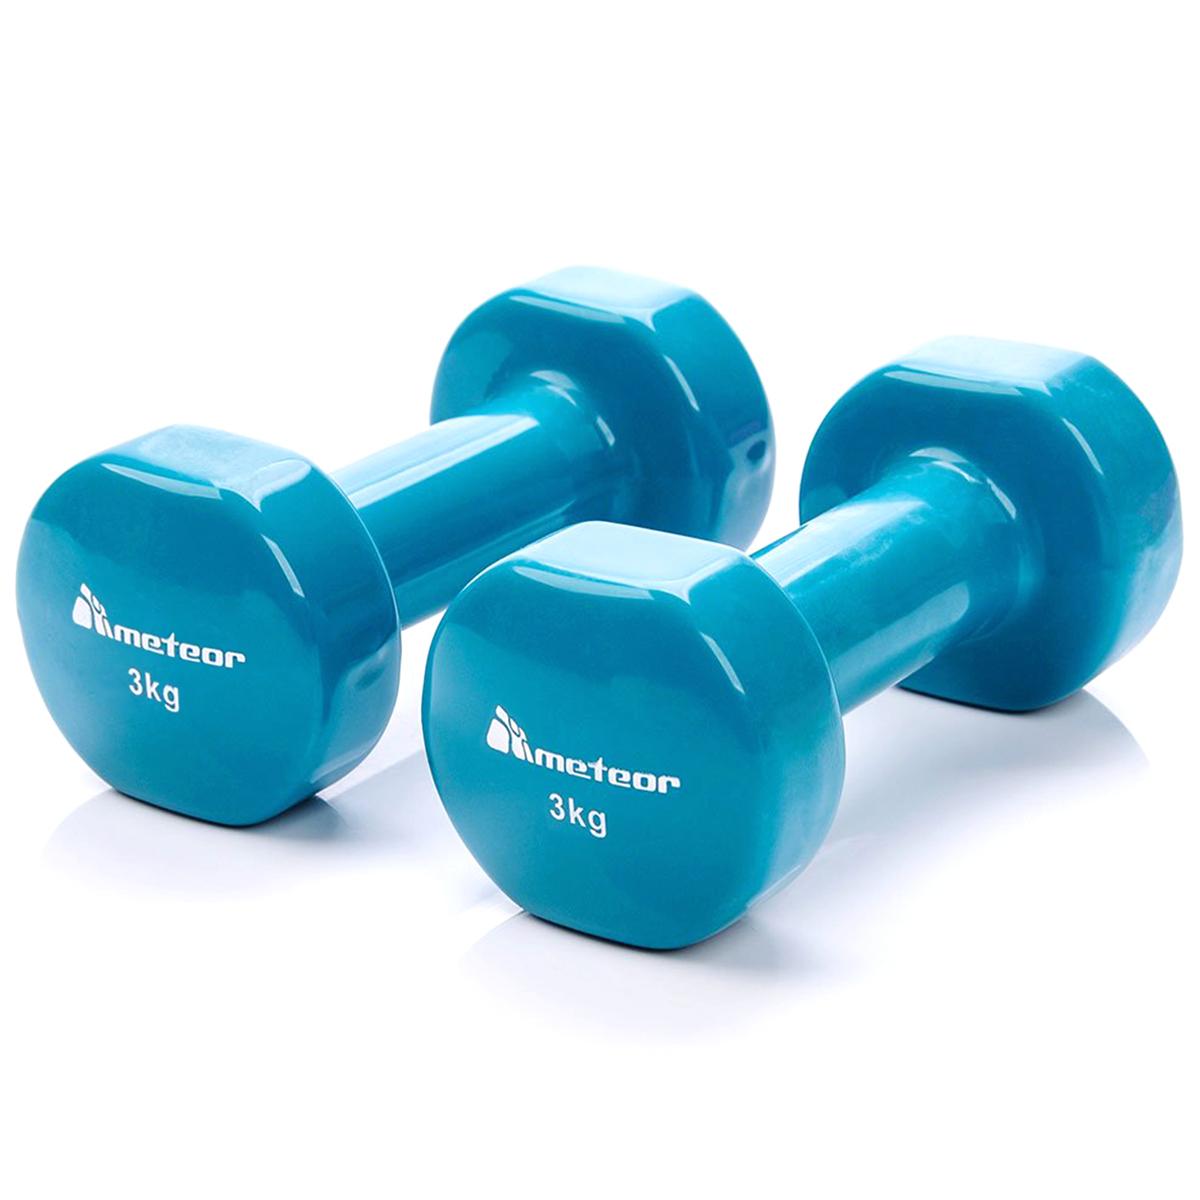 METEOR-0-5-6kg-Anti-Slip-Dumbbell-Pair-Weight-Lifting-Home-Gym-Fitness-Dumbbells thumbnail 74